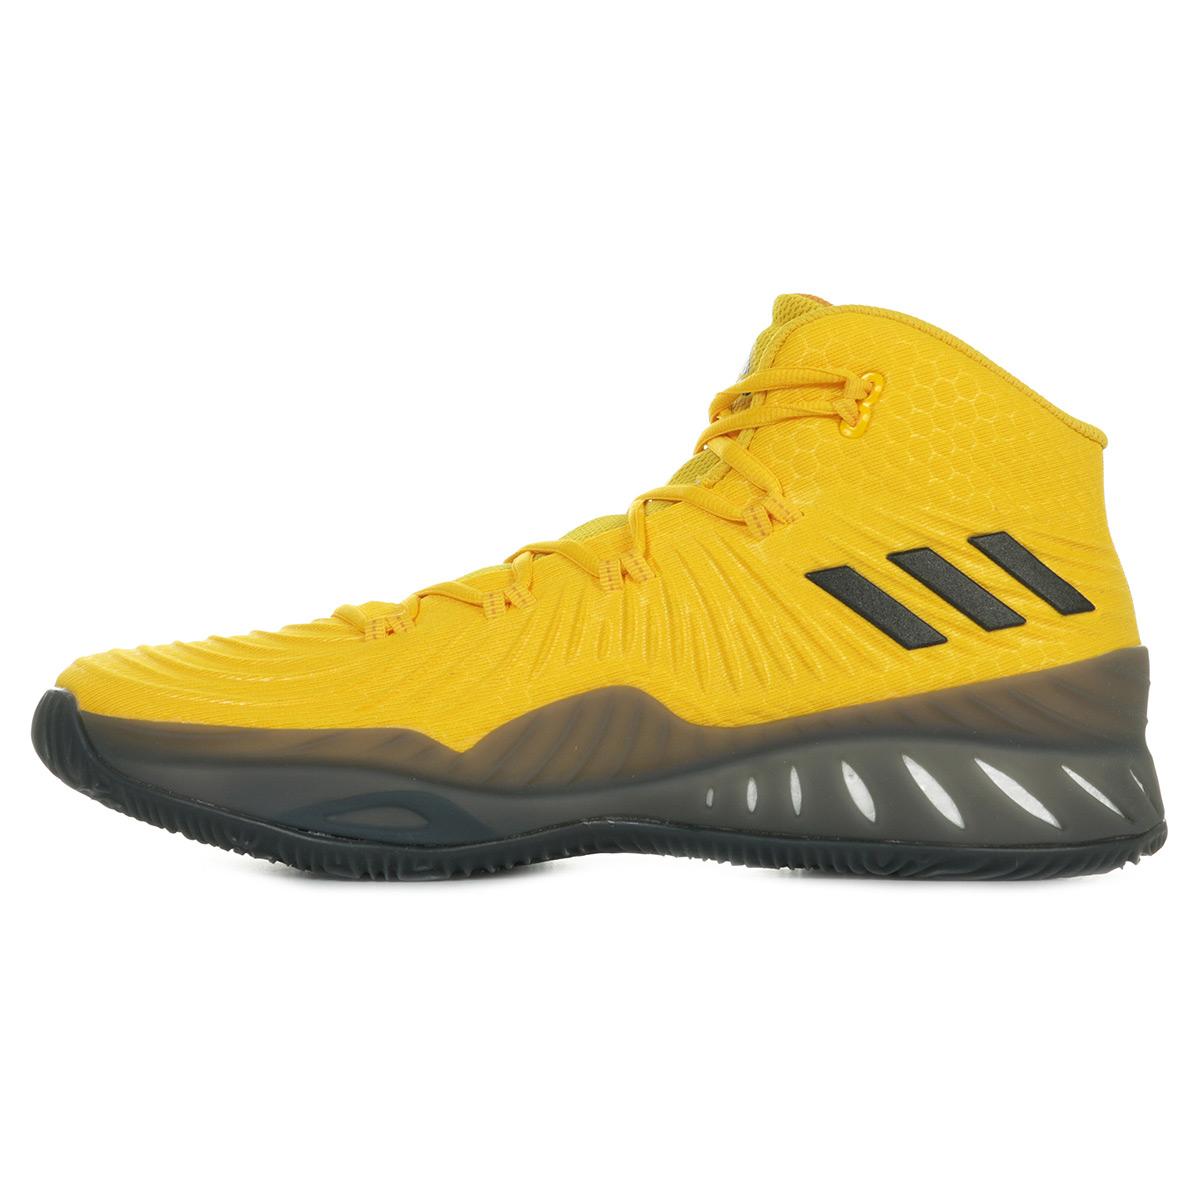 Crazy Explosive Chaussure basket ball homme Adidas   Espace des Marques